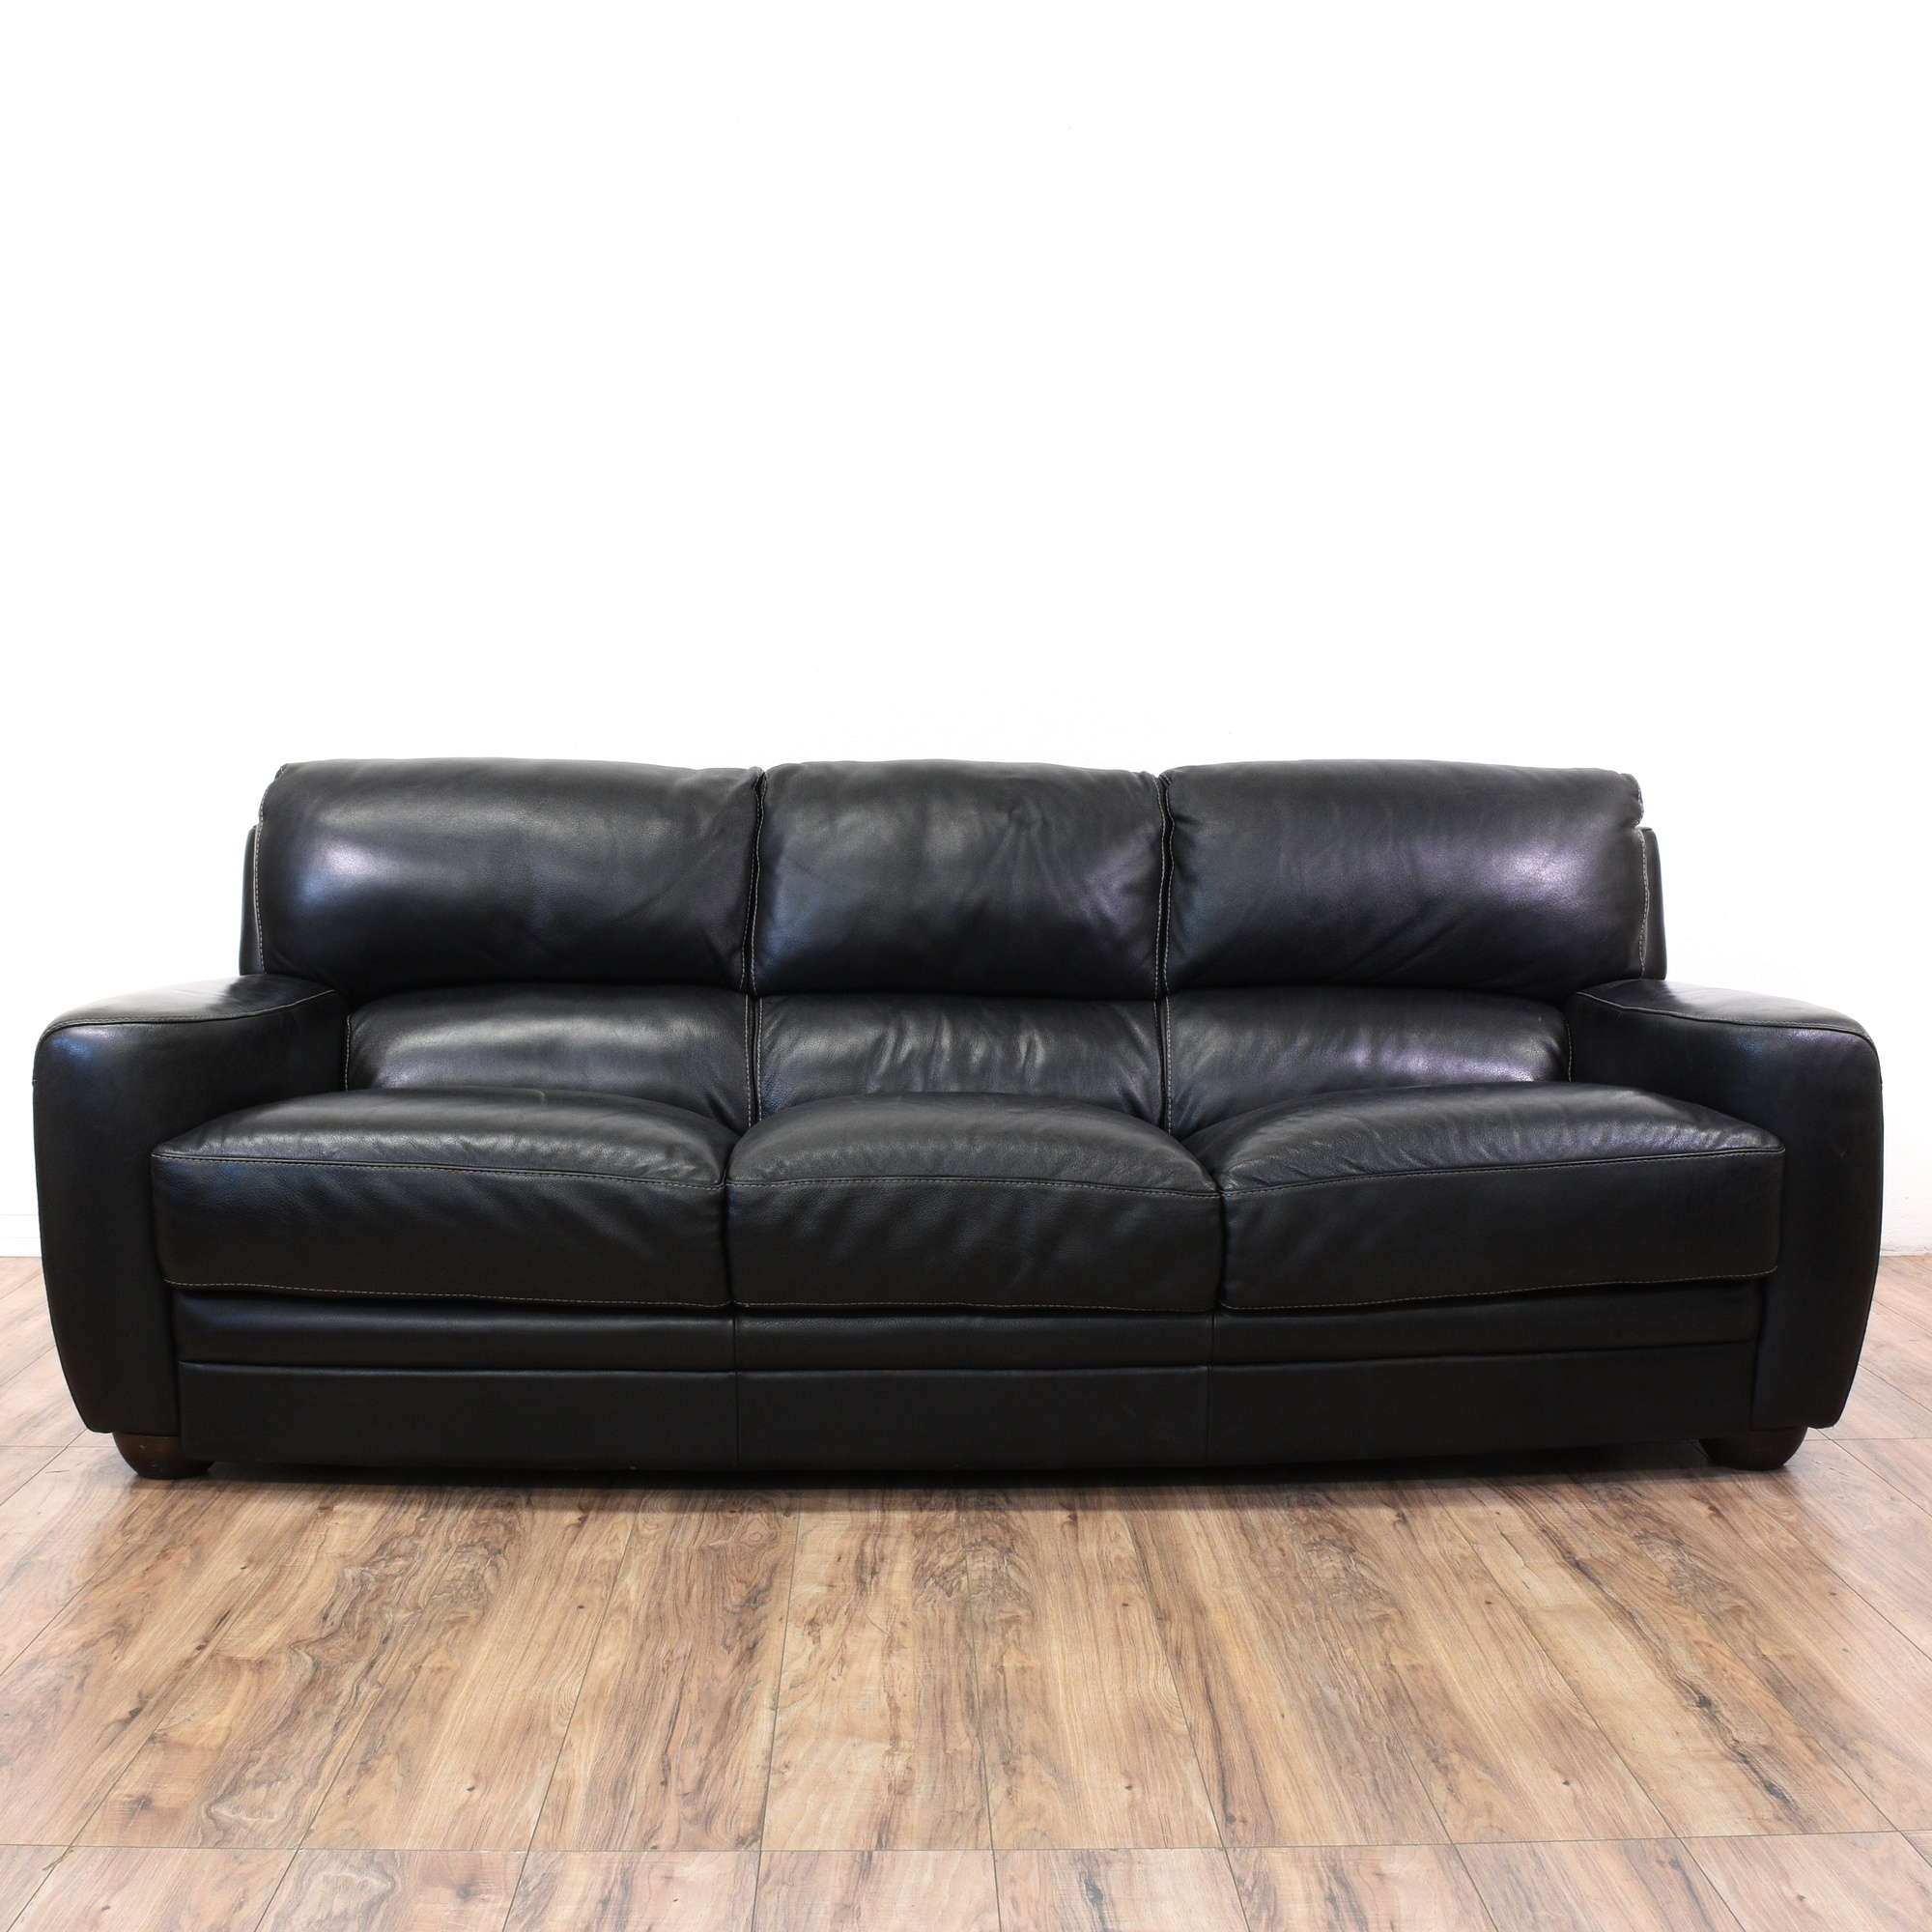 Black Leather Sofitalia Cushion Sofa Loveseat Vintage Furniture San Go